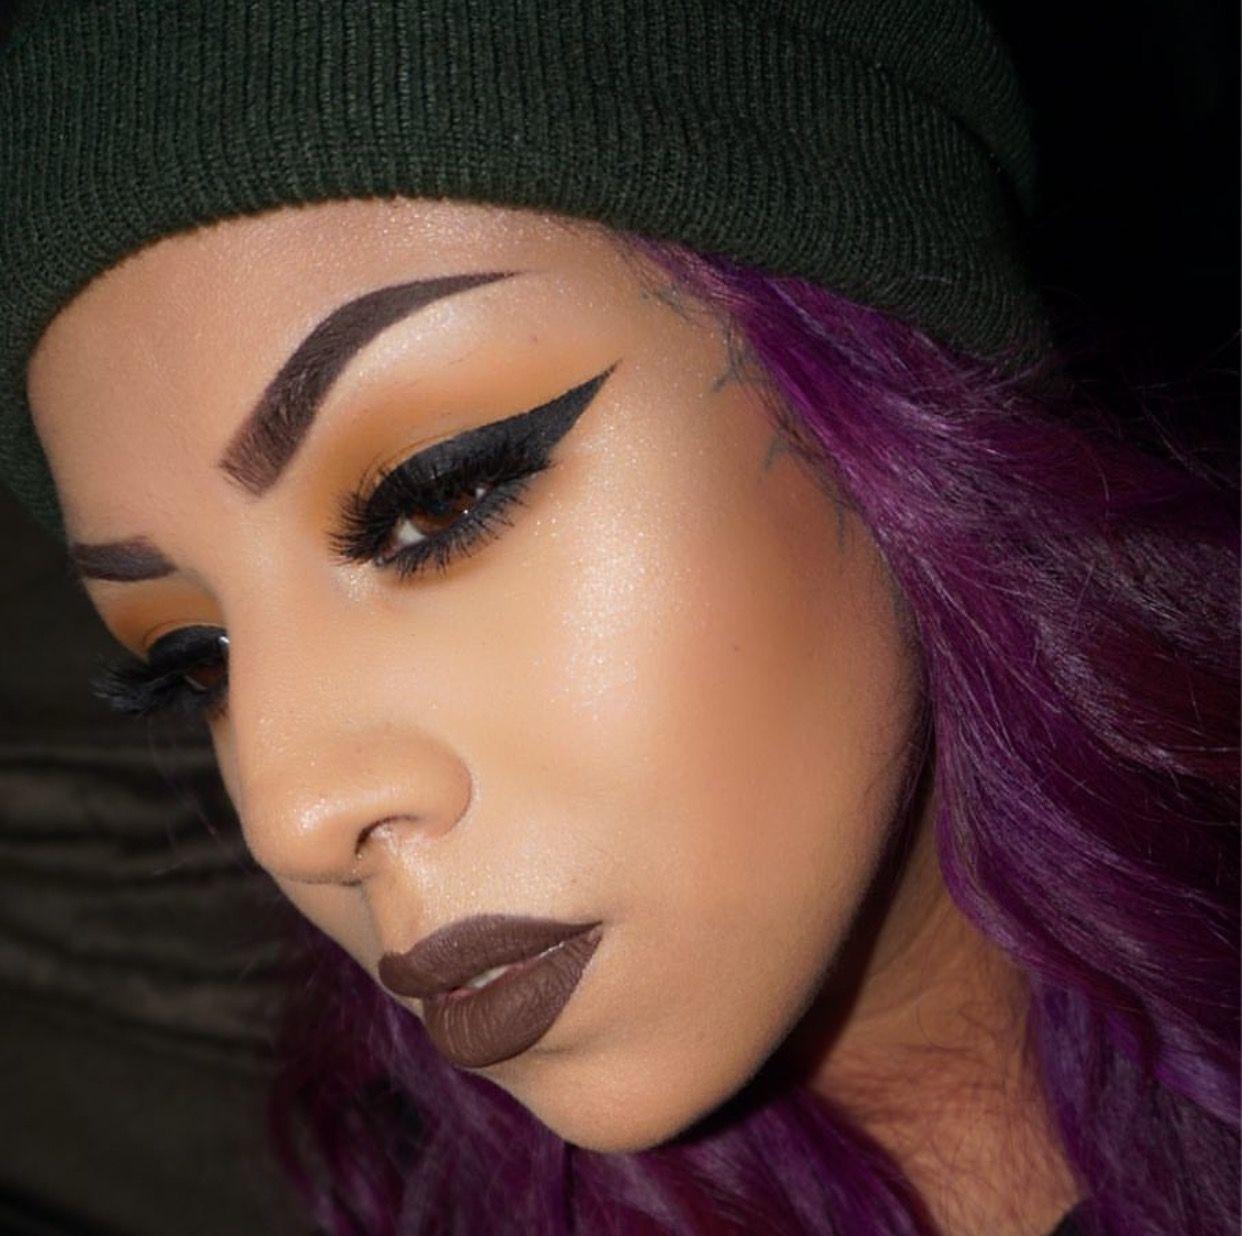 Maybelline fitme foundation. LA girl cosmetics concealer